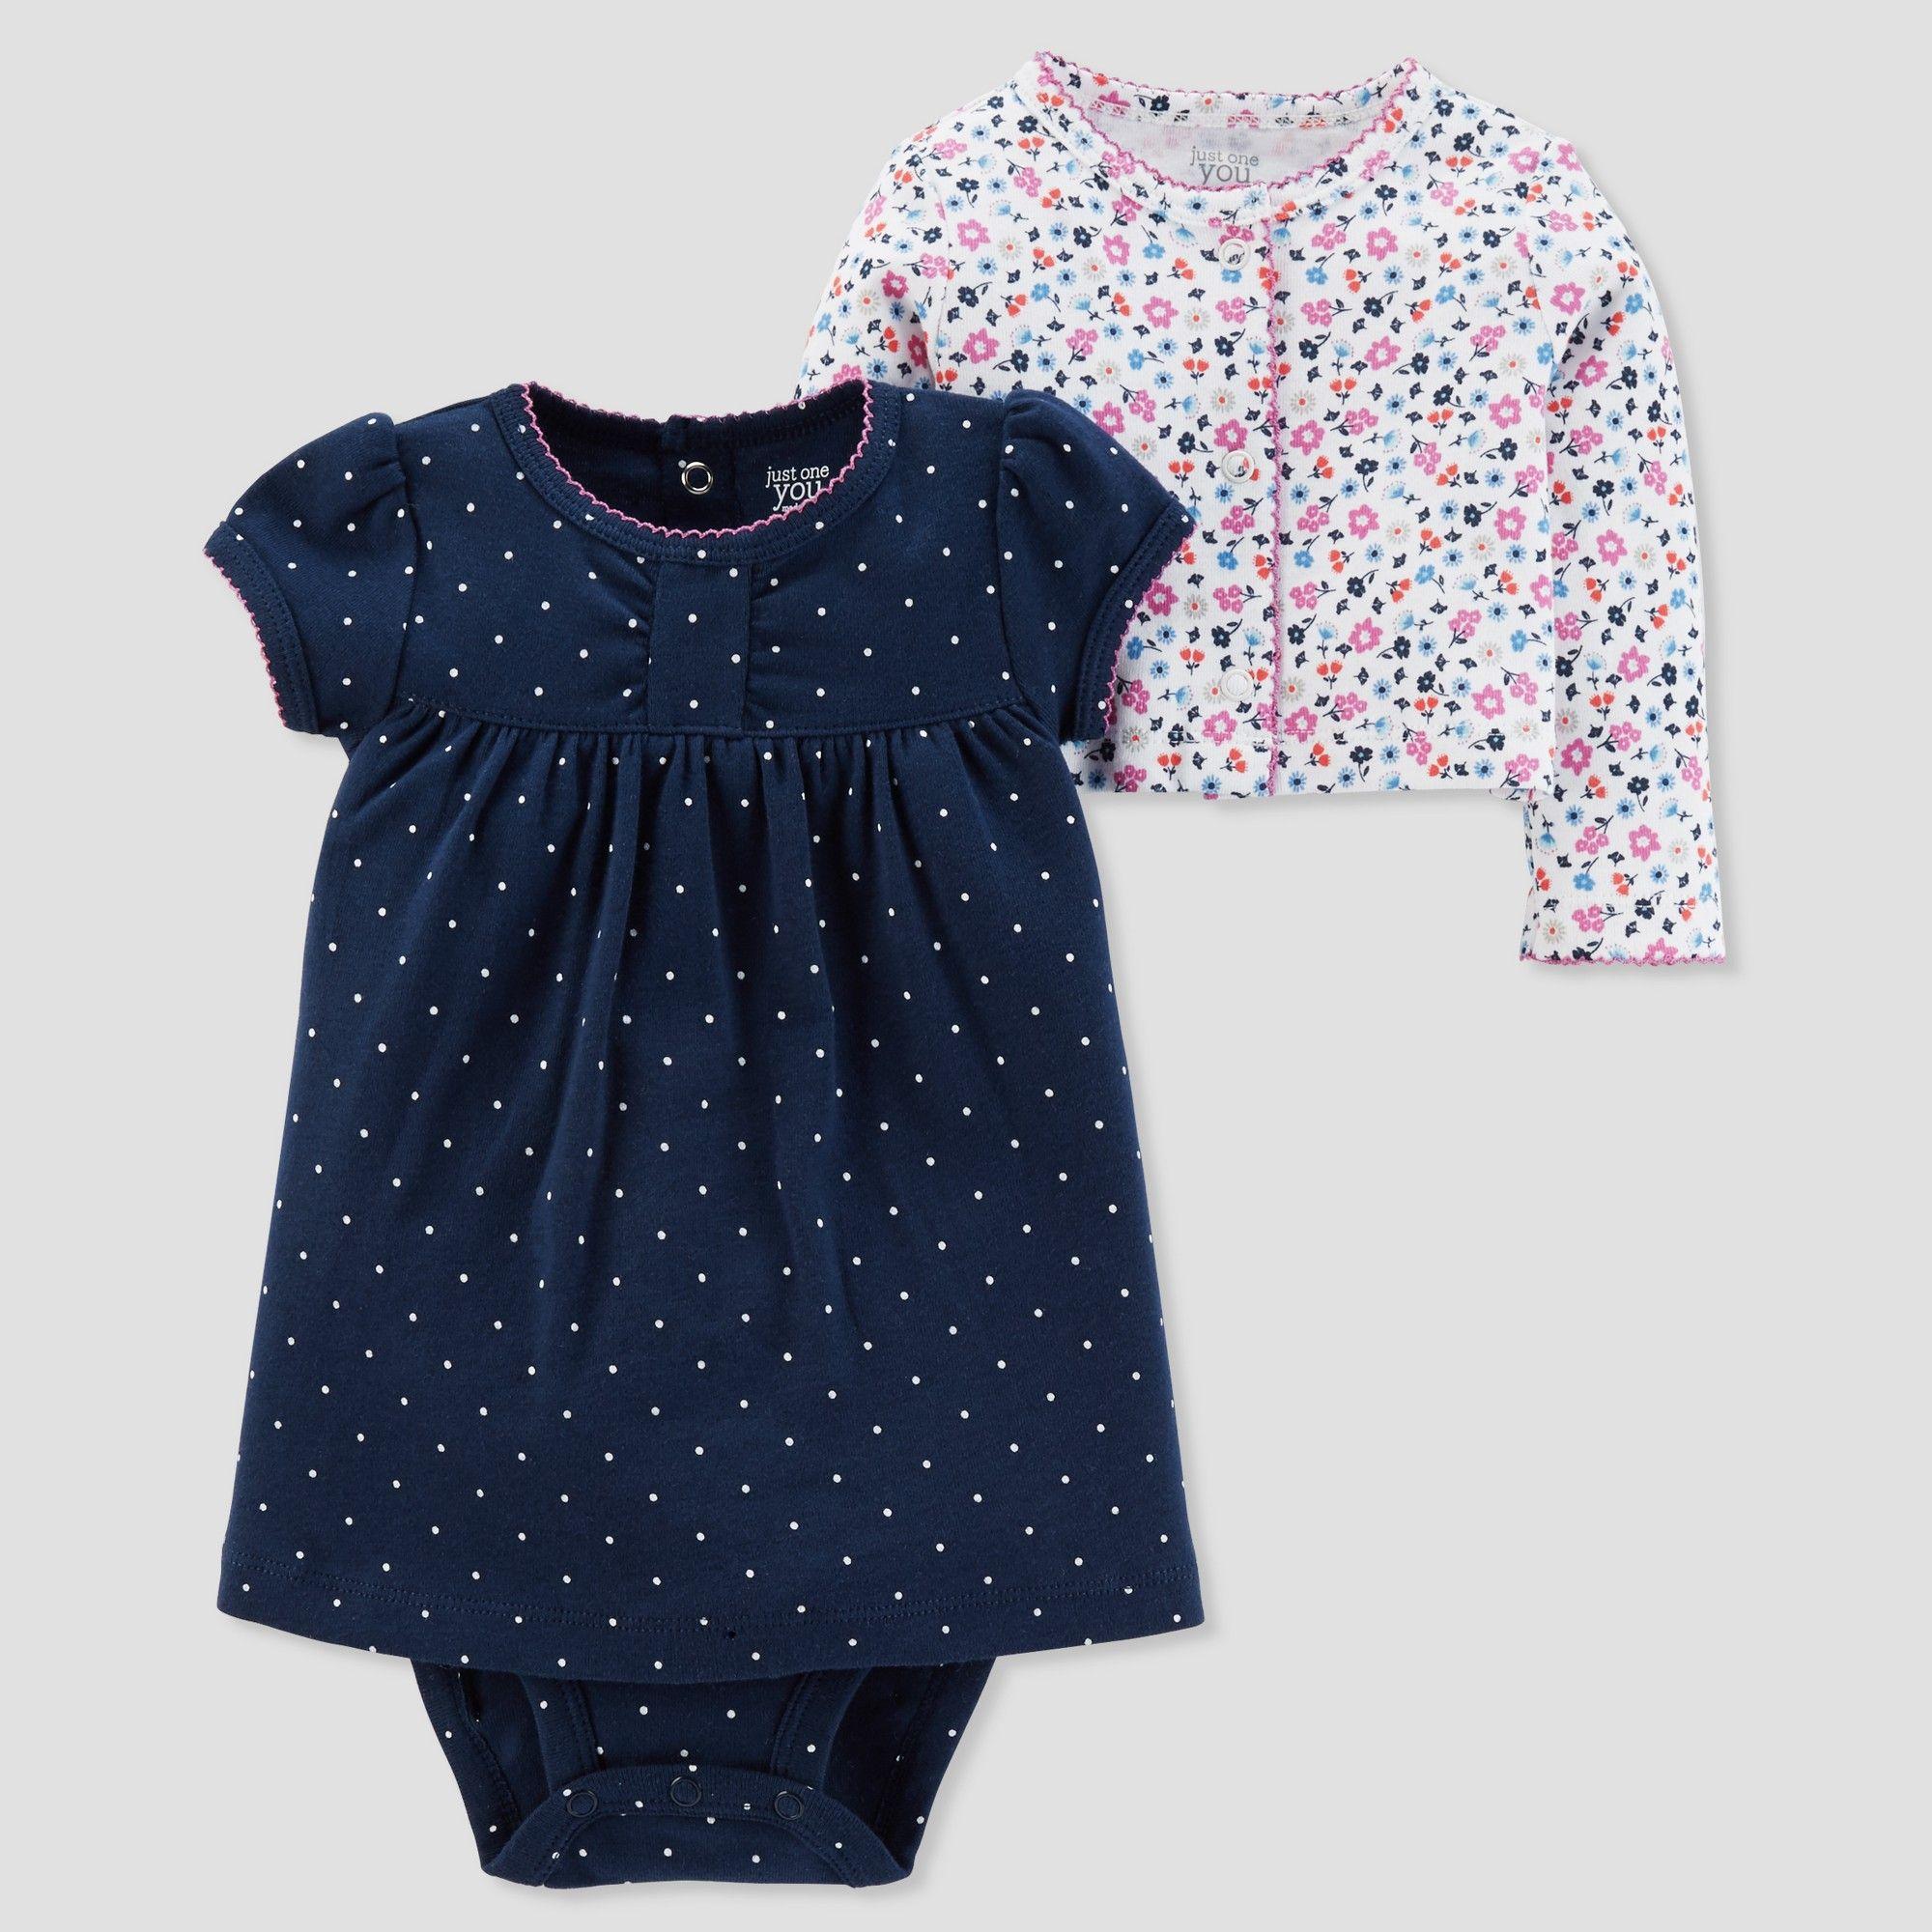 a408e50d3b3ba Baby Girls' 2pc Print Dress Set - Just One You made by carter's Navy 3M,  Blue